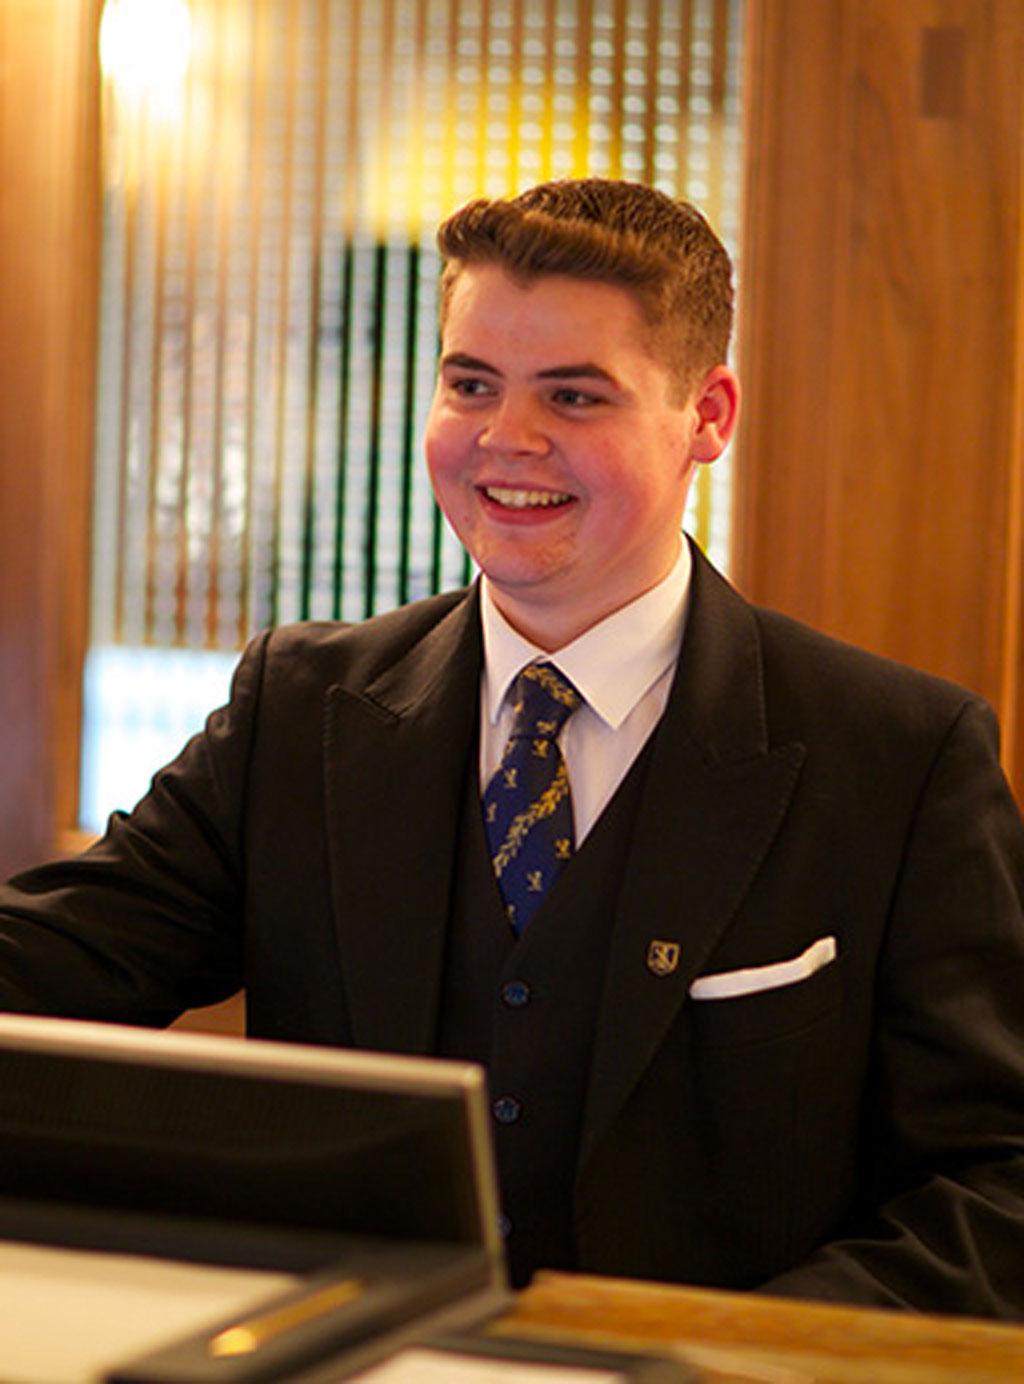 Hotel Front Office Management - AbeBooks - James A. Bardi